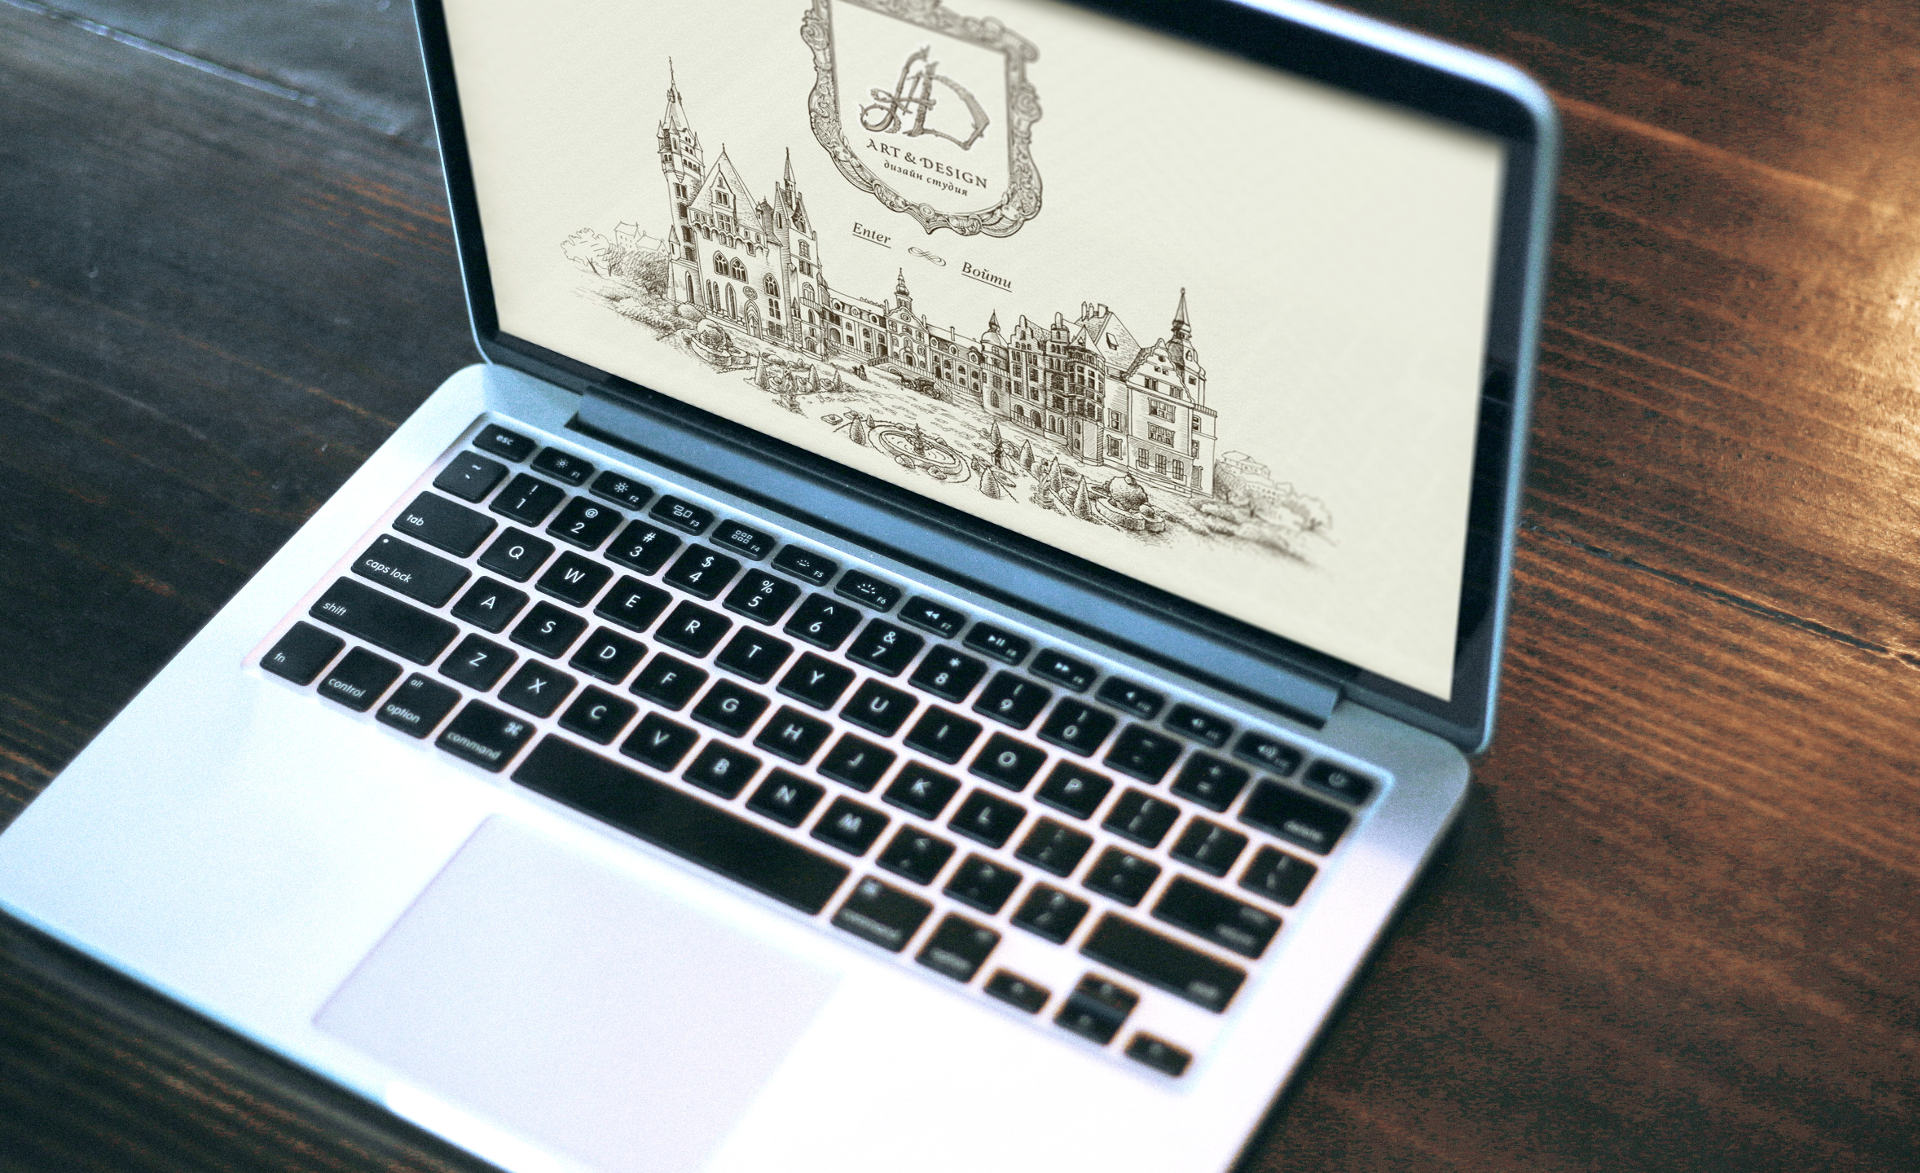 Разработка of the website архитектурного бюро, architecture bureau site development